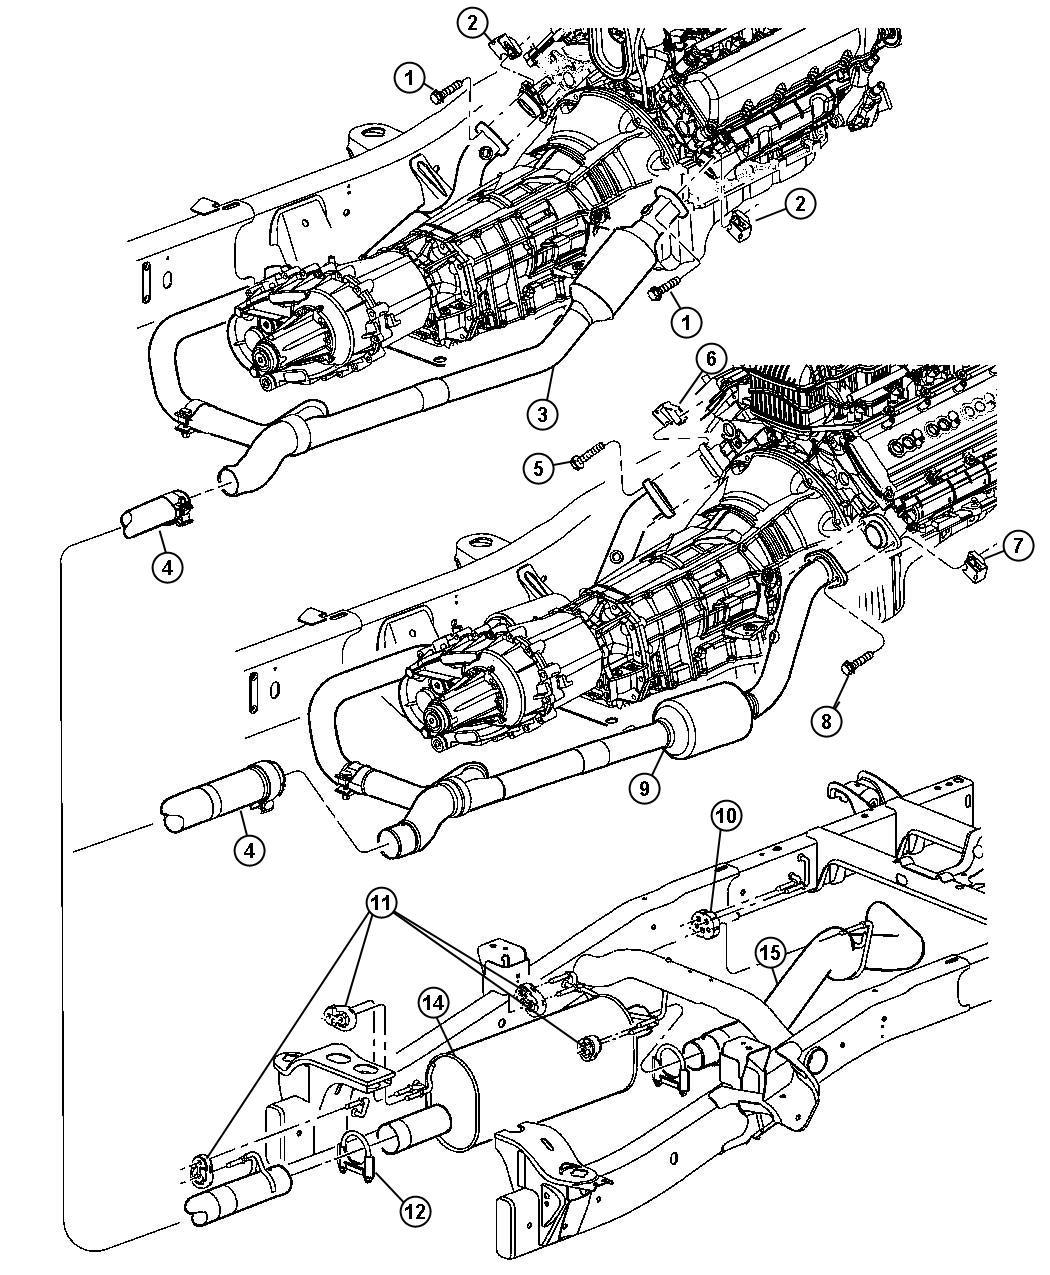 manifold to intermediate pipe - dodge ram forum